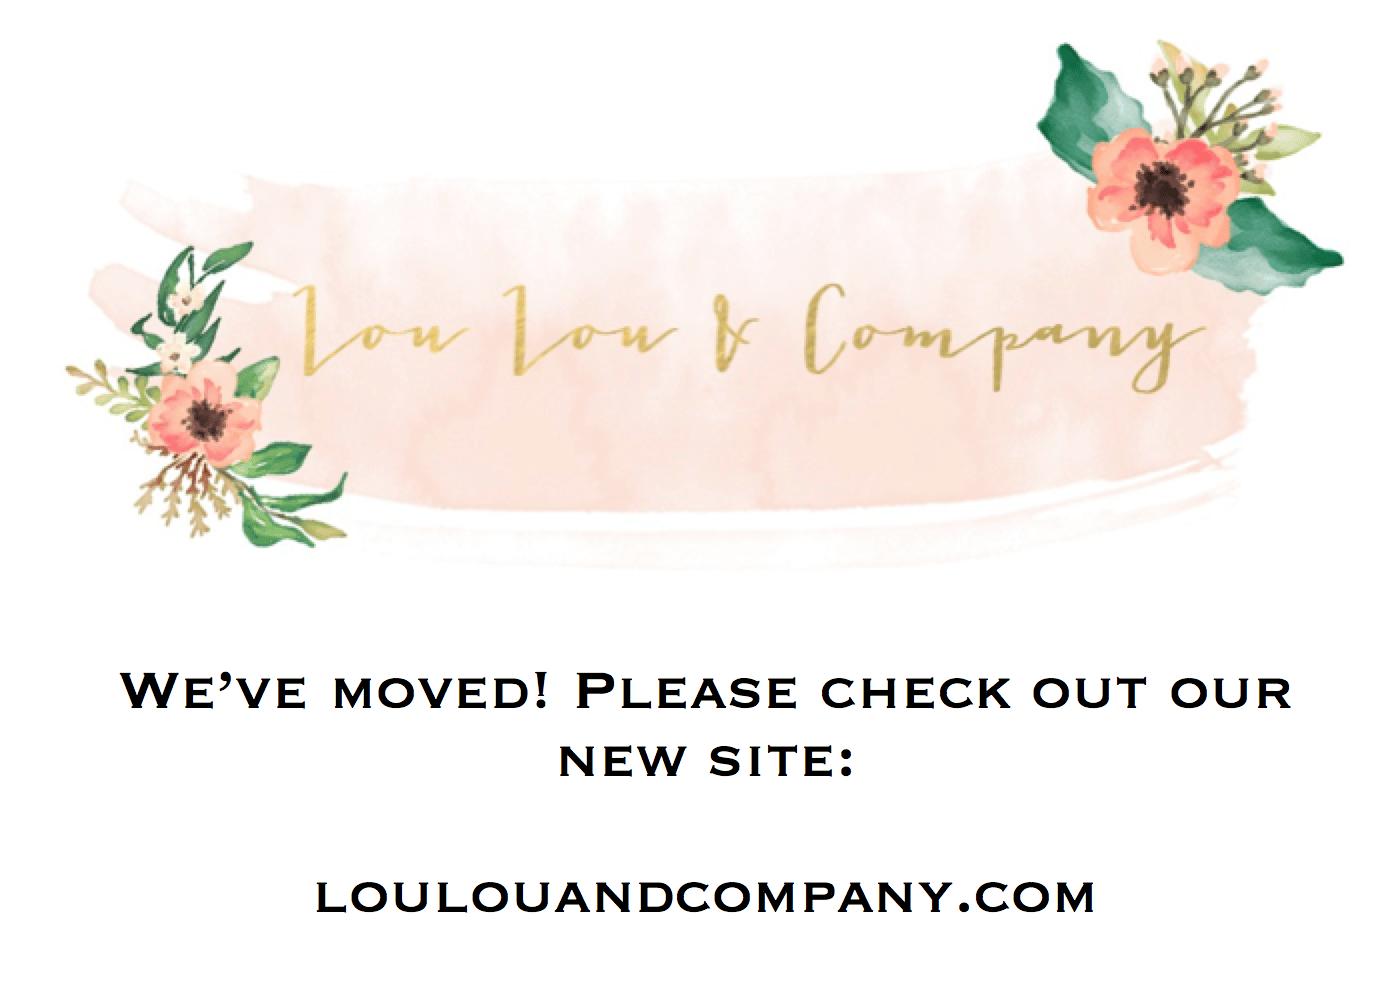 Lou Lou and Company